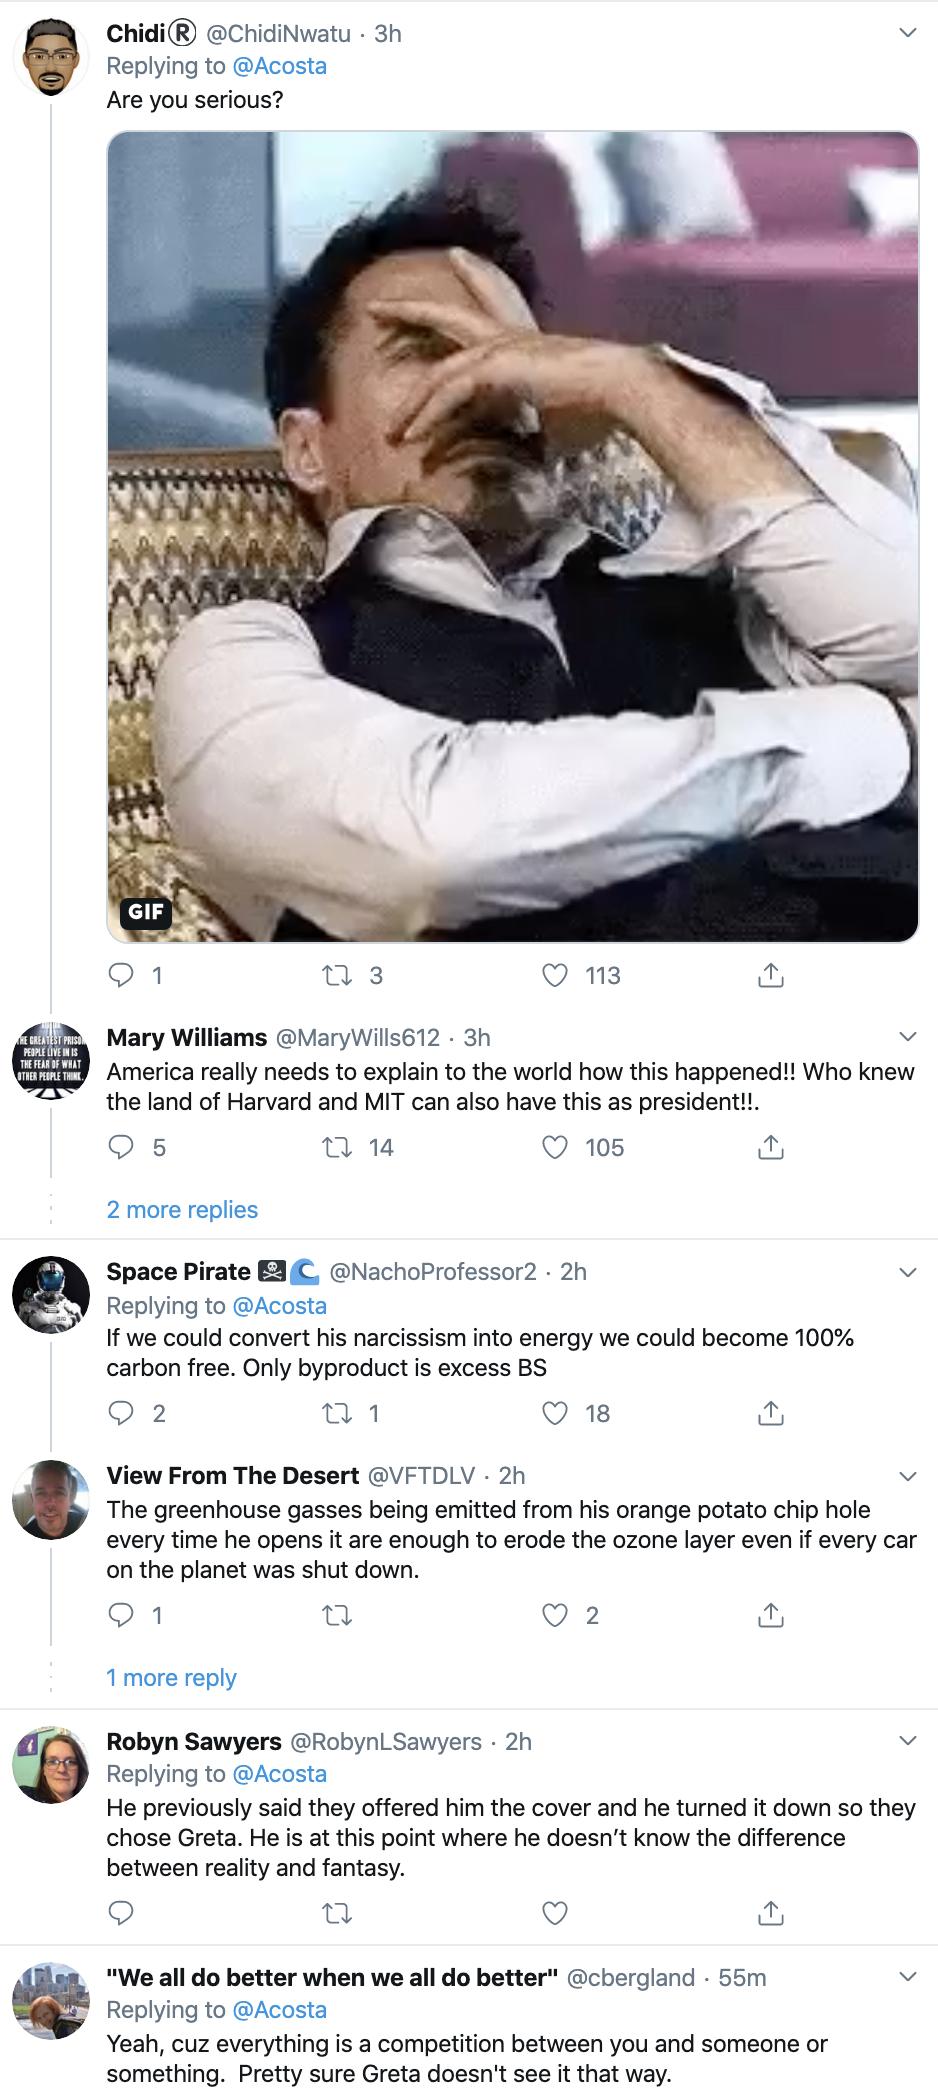 Screen-Shot-2020-01-22-at-9.29.57-AM Acosta Follows Trump In Switzerland & Publicly Trolls Him Hard Featured Impeachment Media Top Stories Twitter